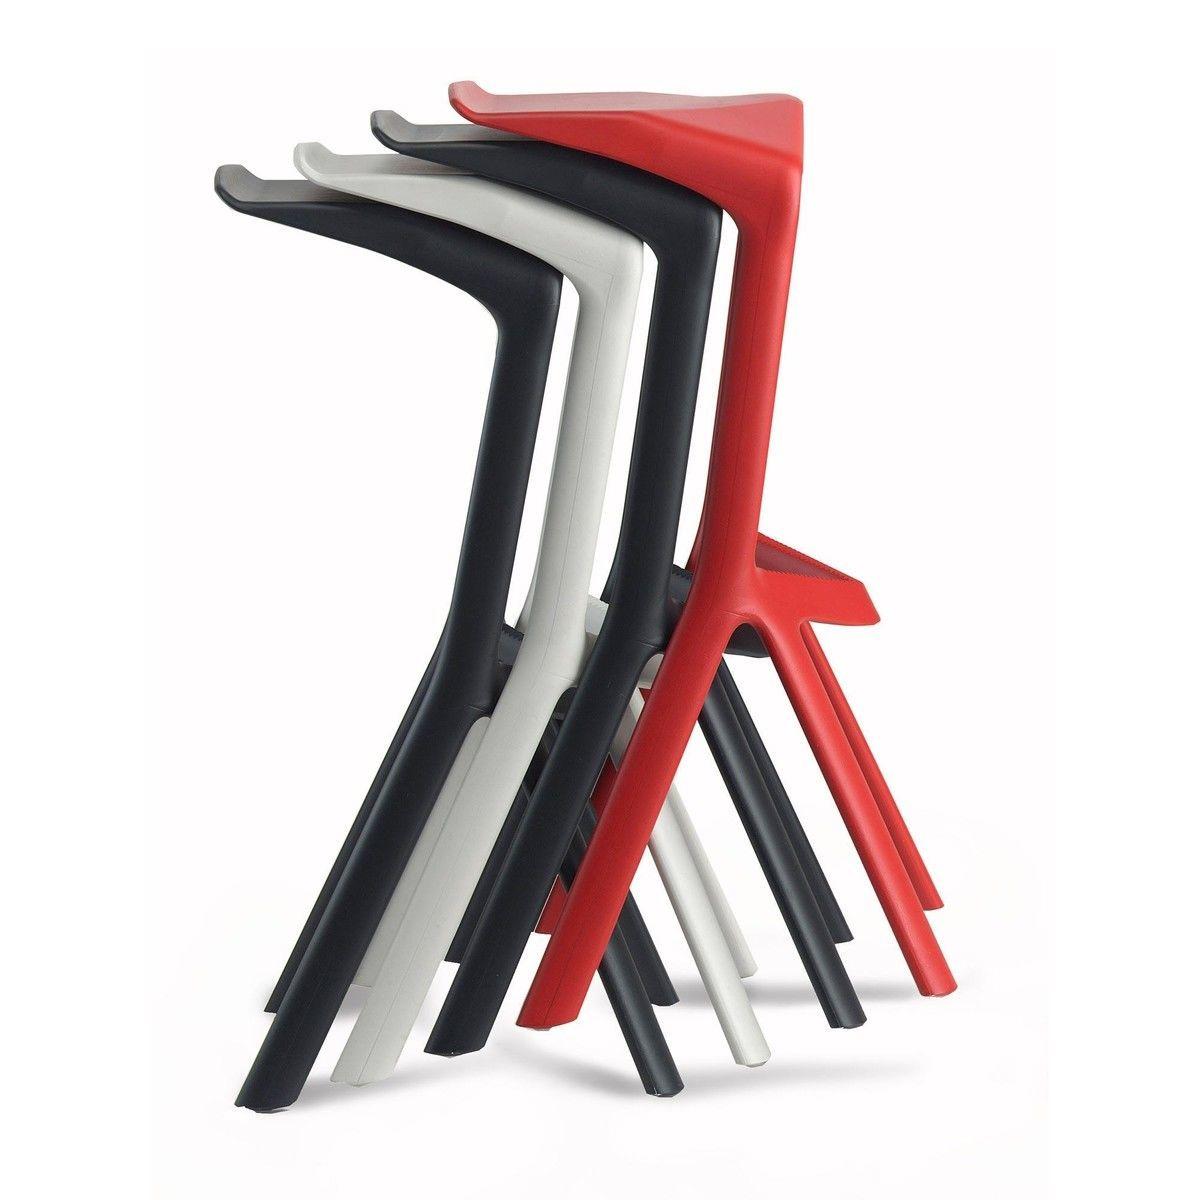 miura barhocker plank konstantin grcic. Black Bedroom Furniture Sets. Home Design Ideas